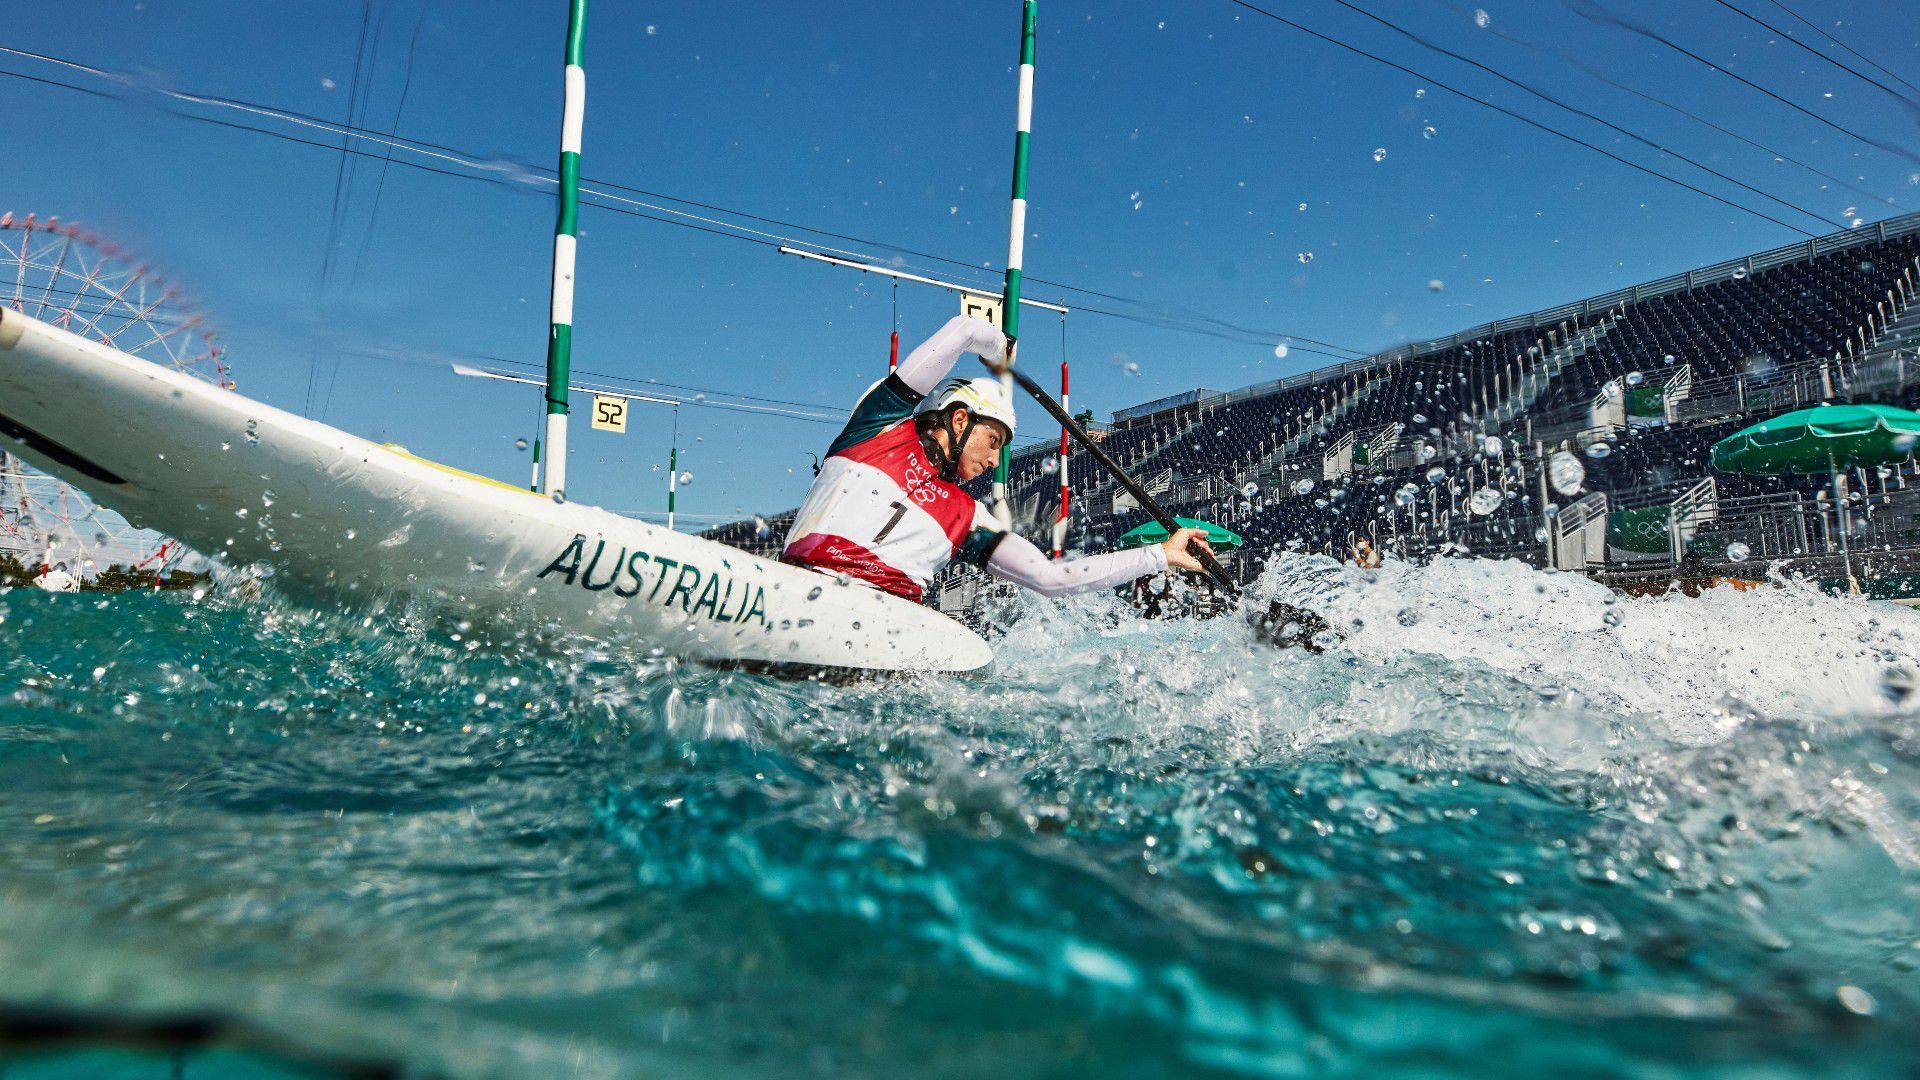 Australian kayaking star Jess Fox eases through in heats of women's slalom